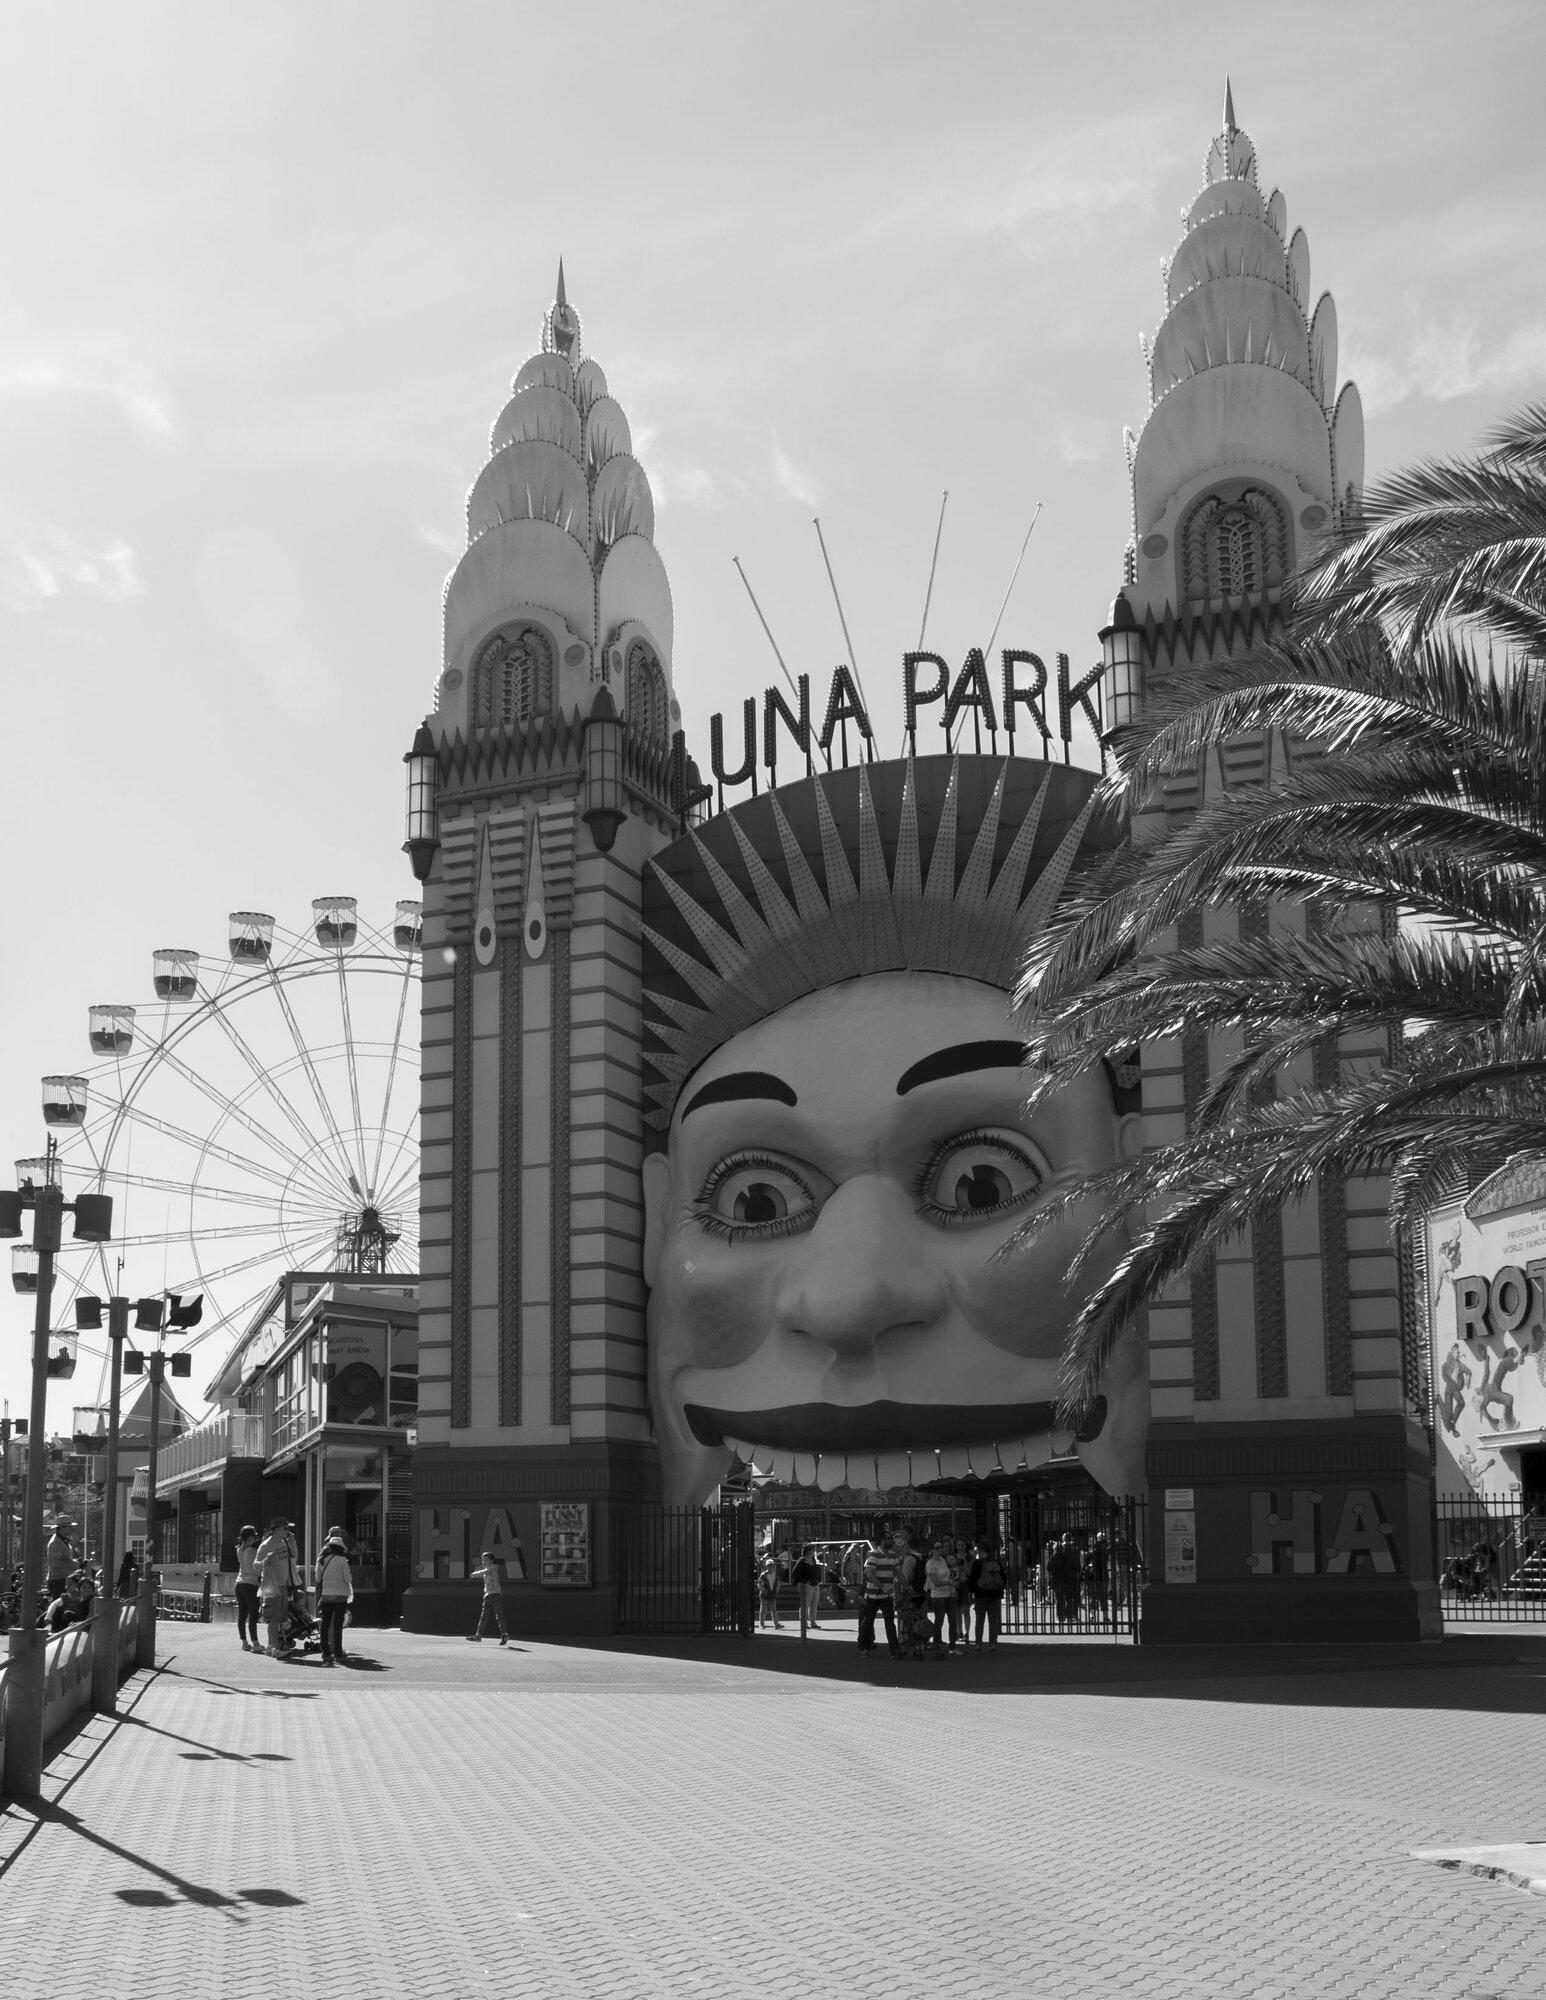 Luna Park BW.jpg